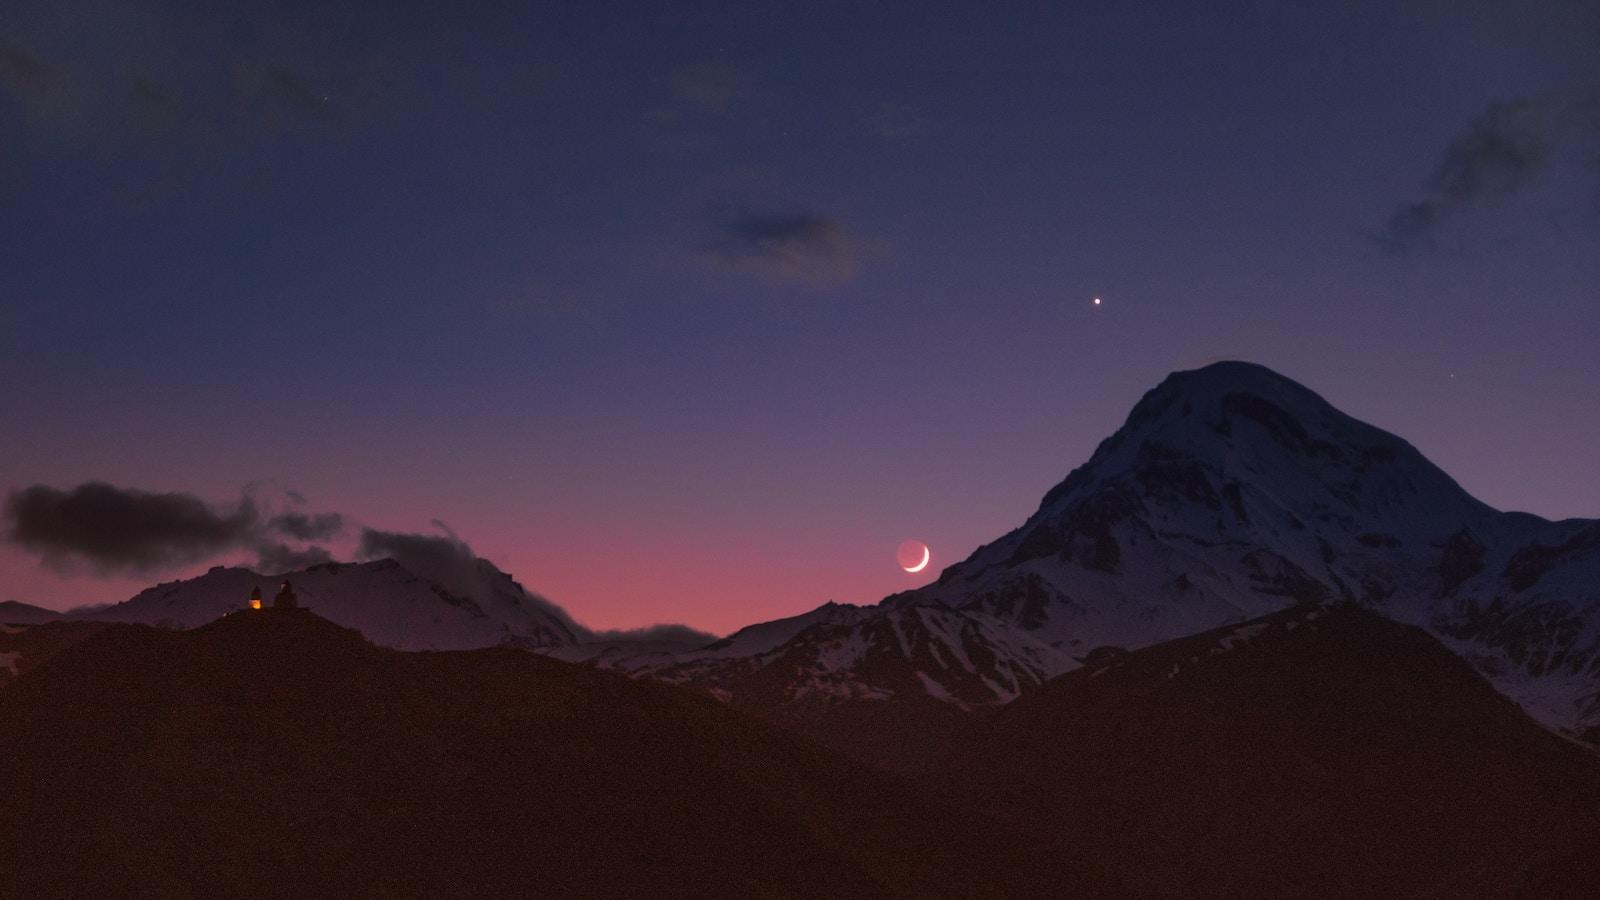 Binance launches globe-spanning Libra competitor, 'Venus'